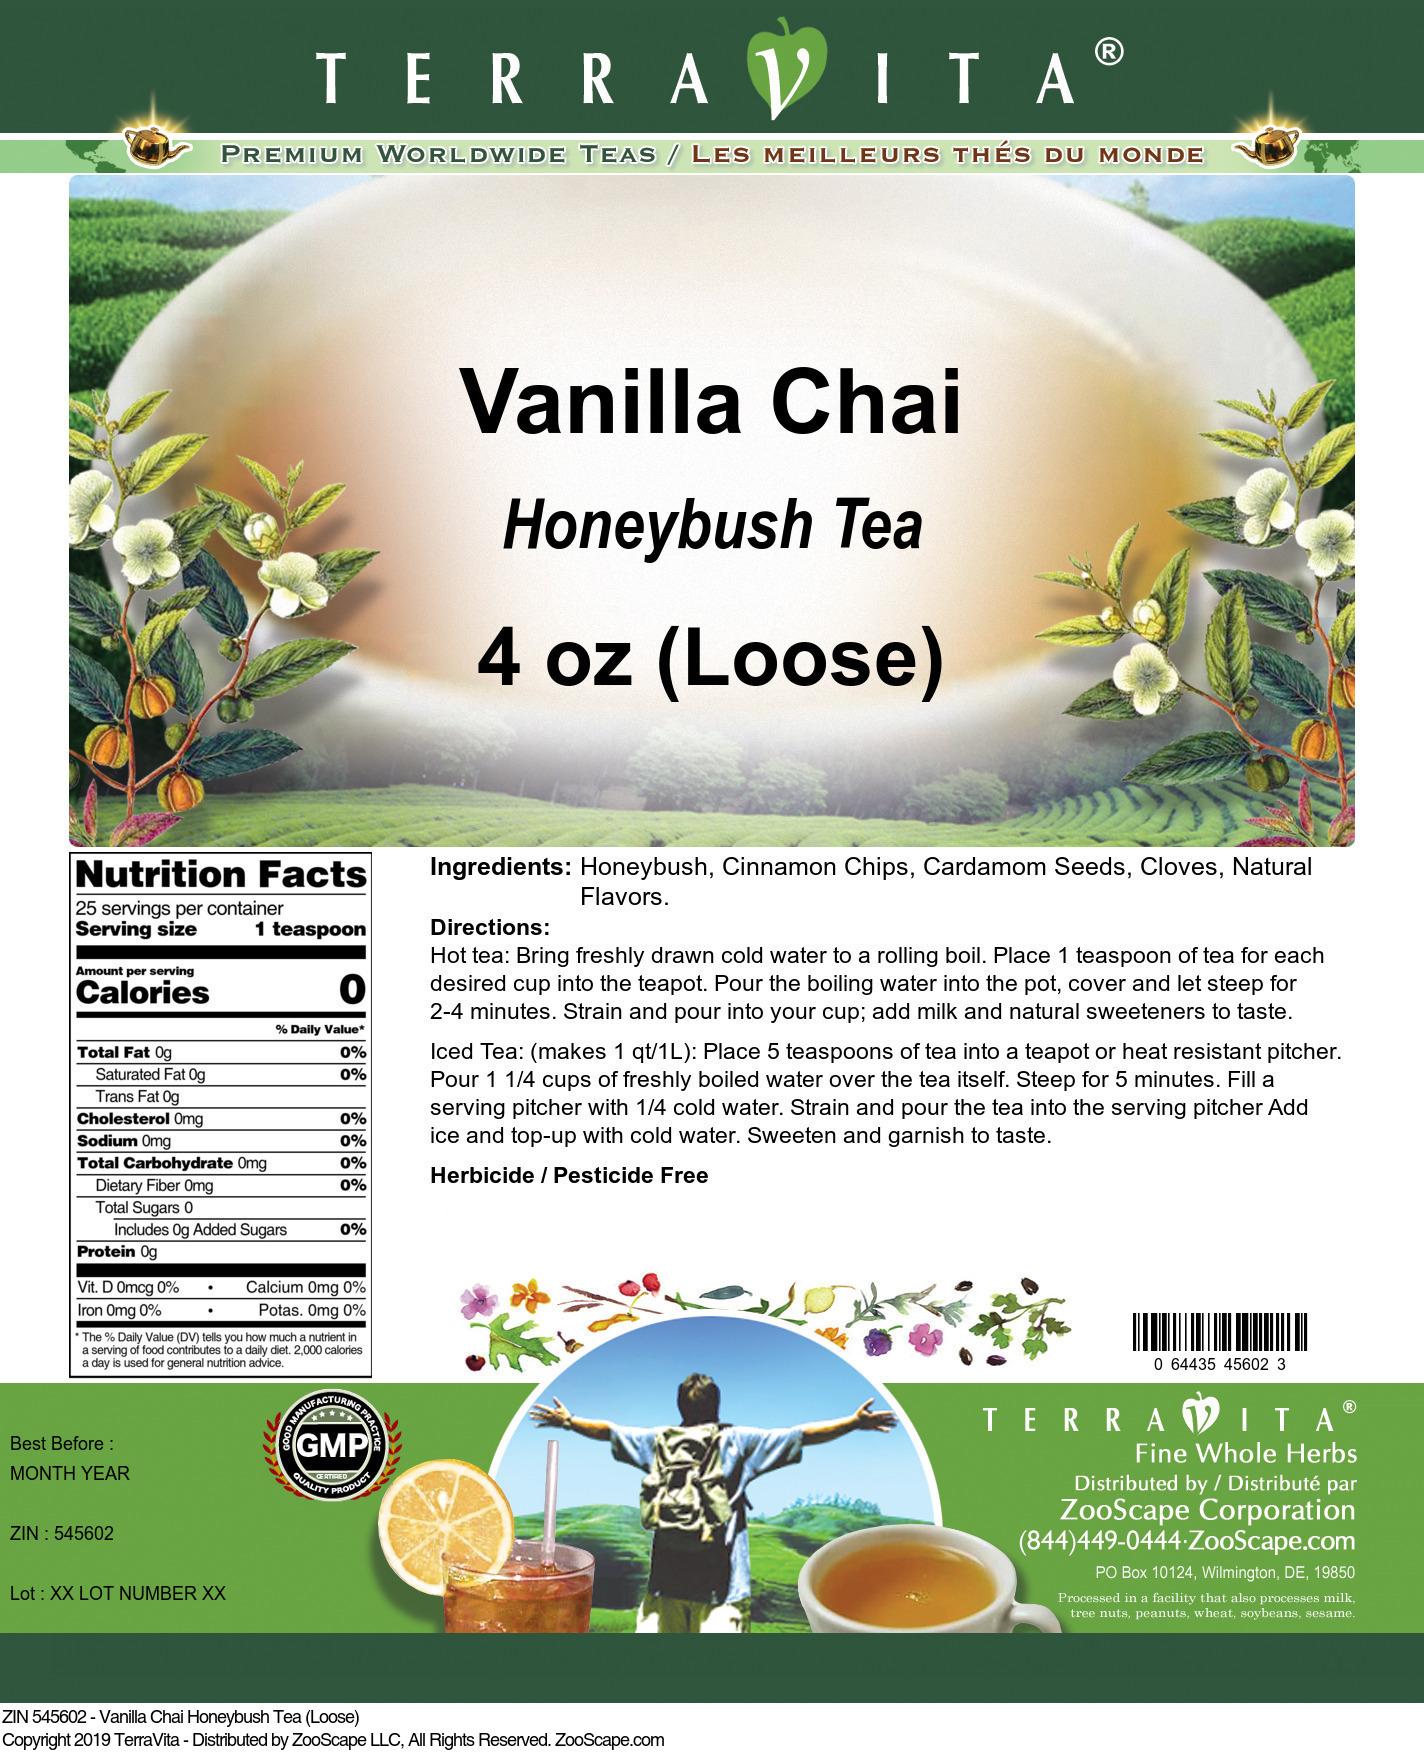 Vanilla Chai Honeybush Tea (Loose)